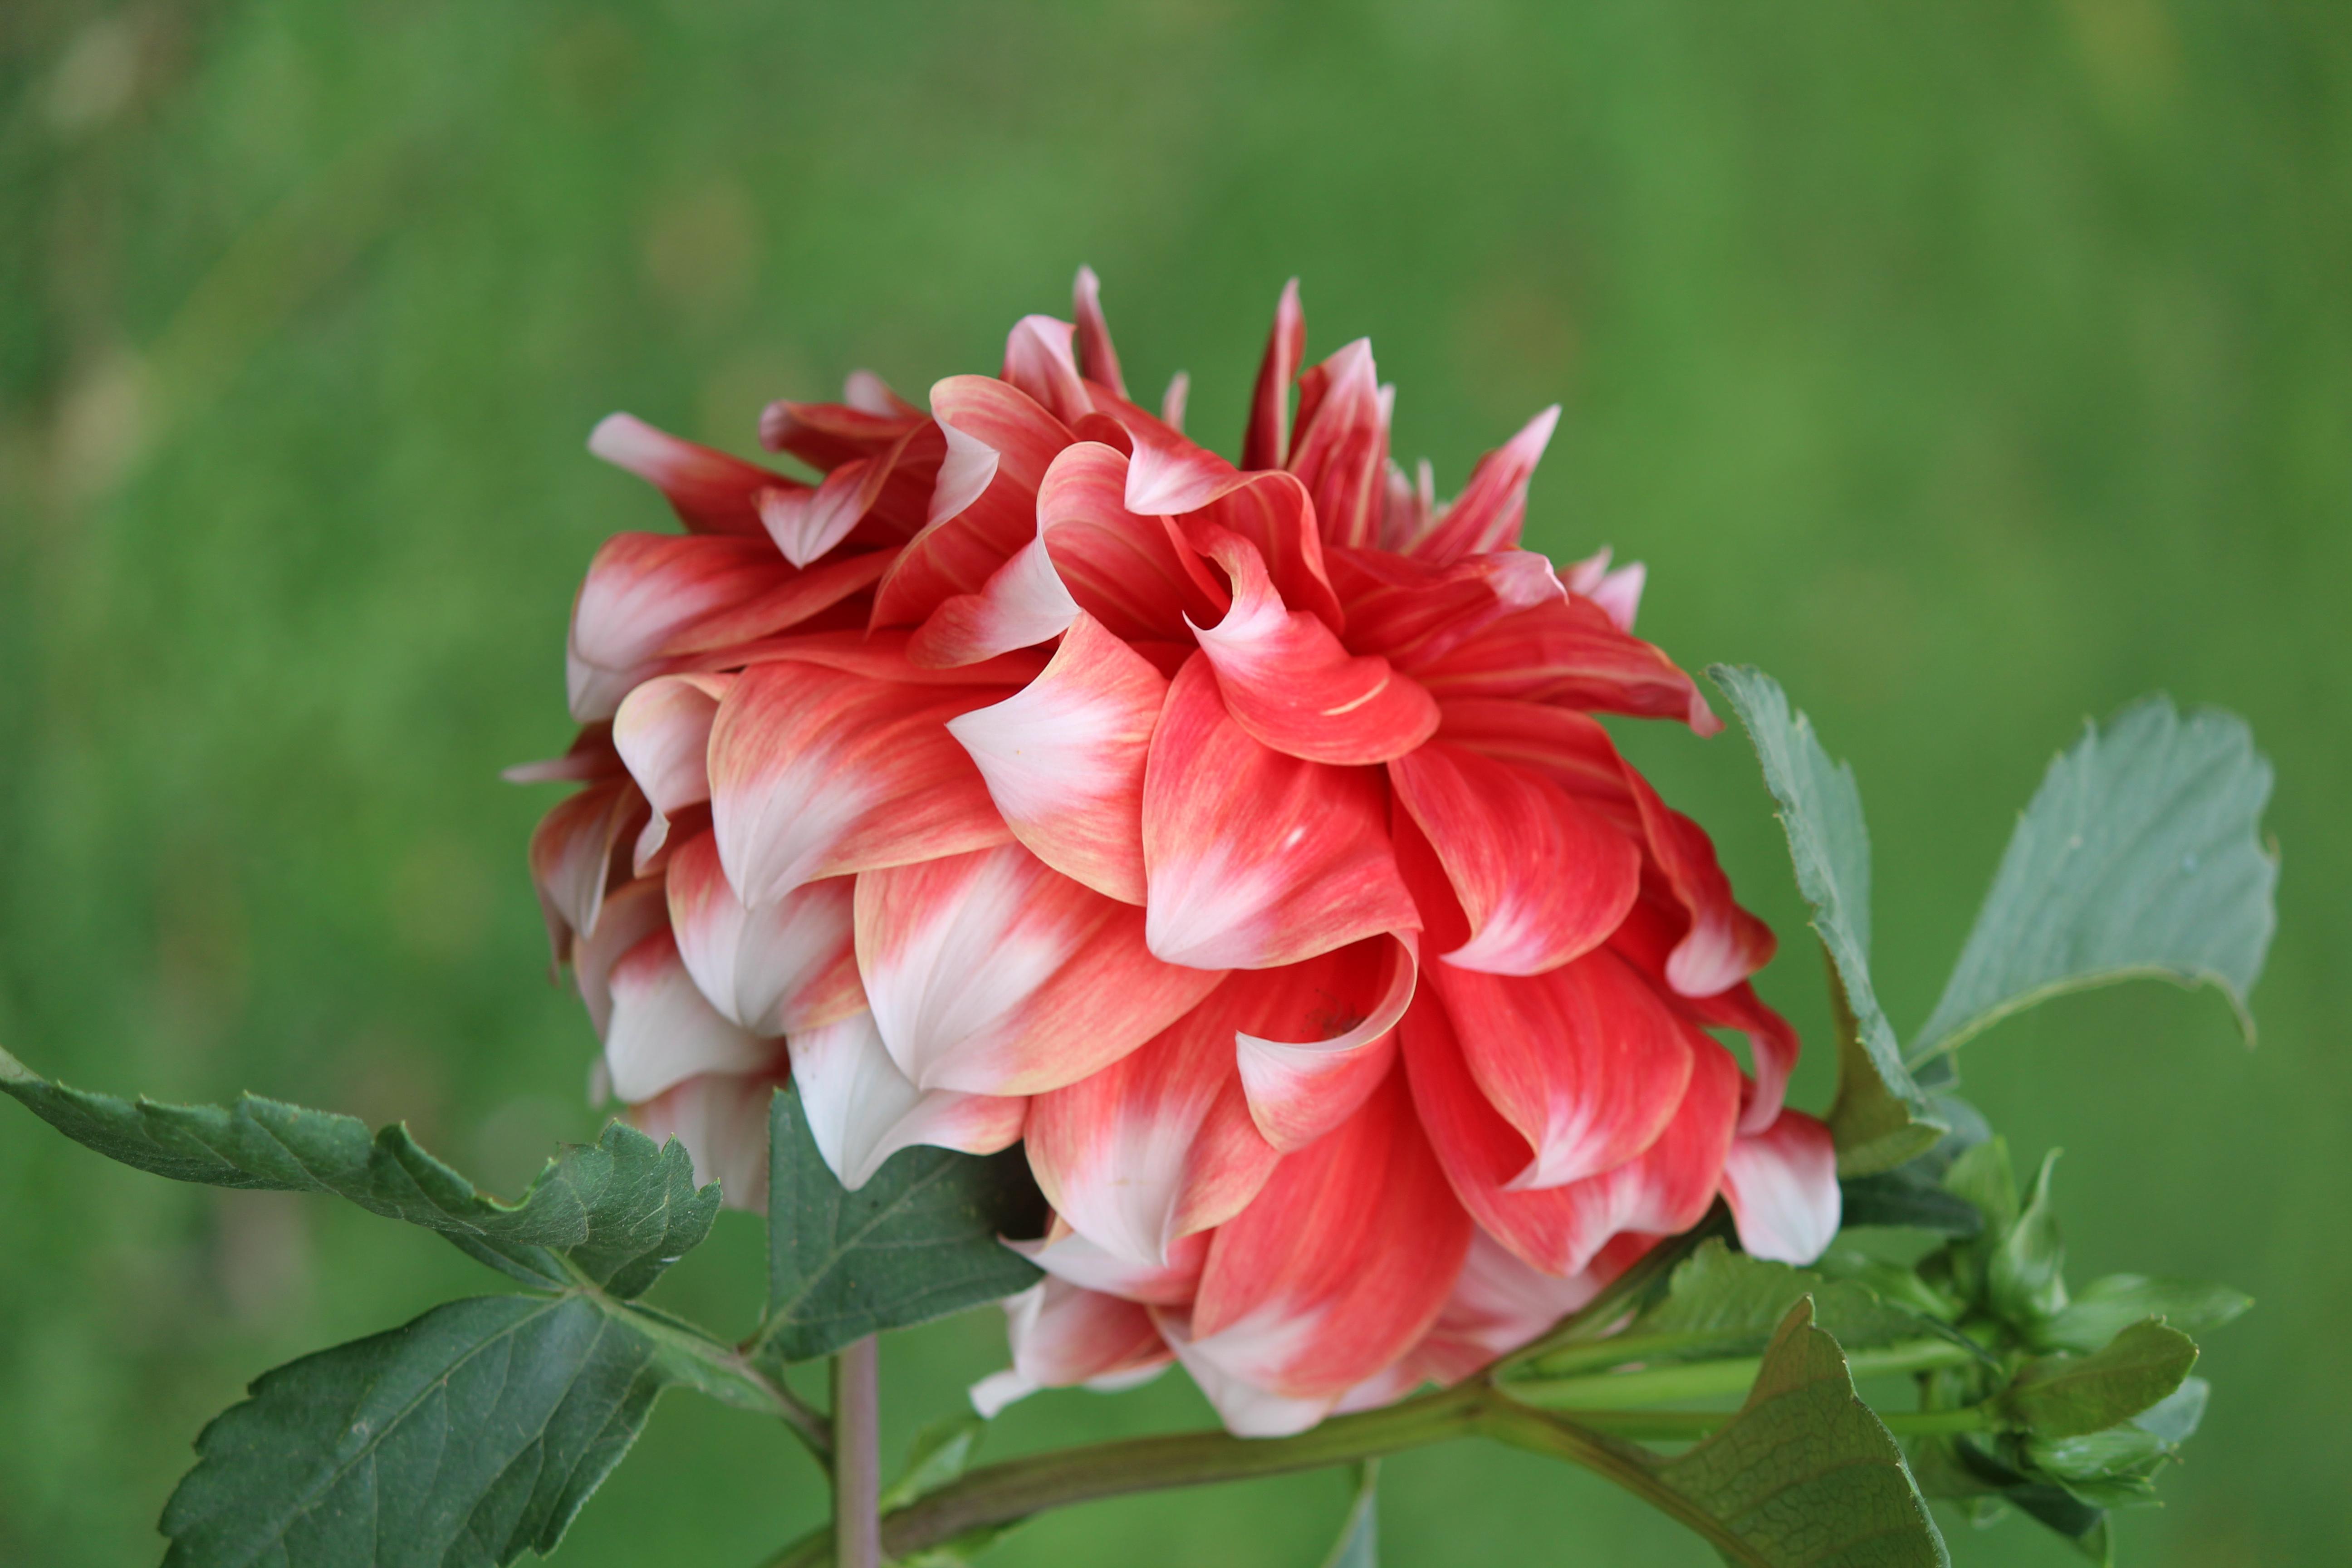 Filered Dahlia Flower Side Viewg Wikimedia Commons